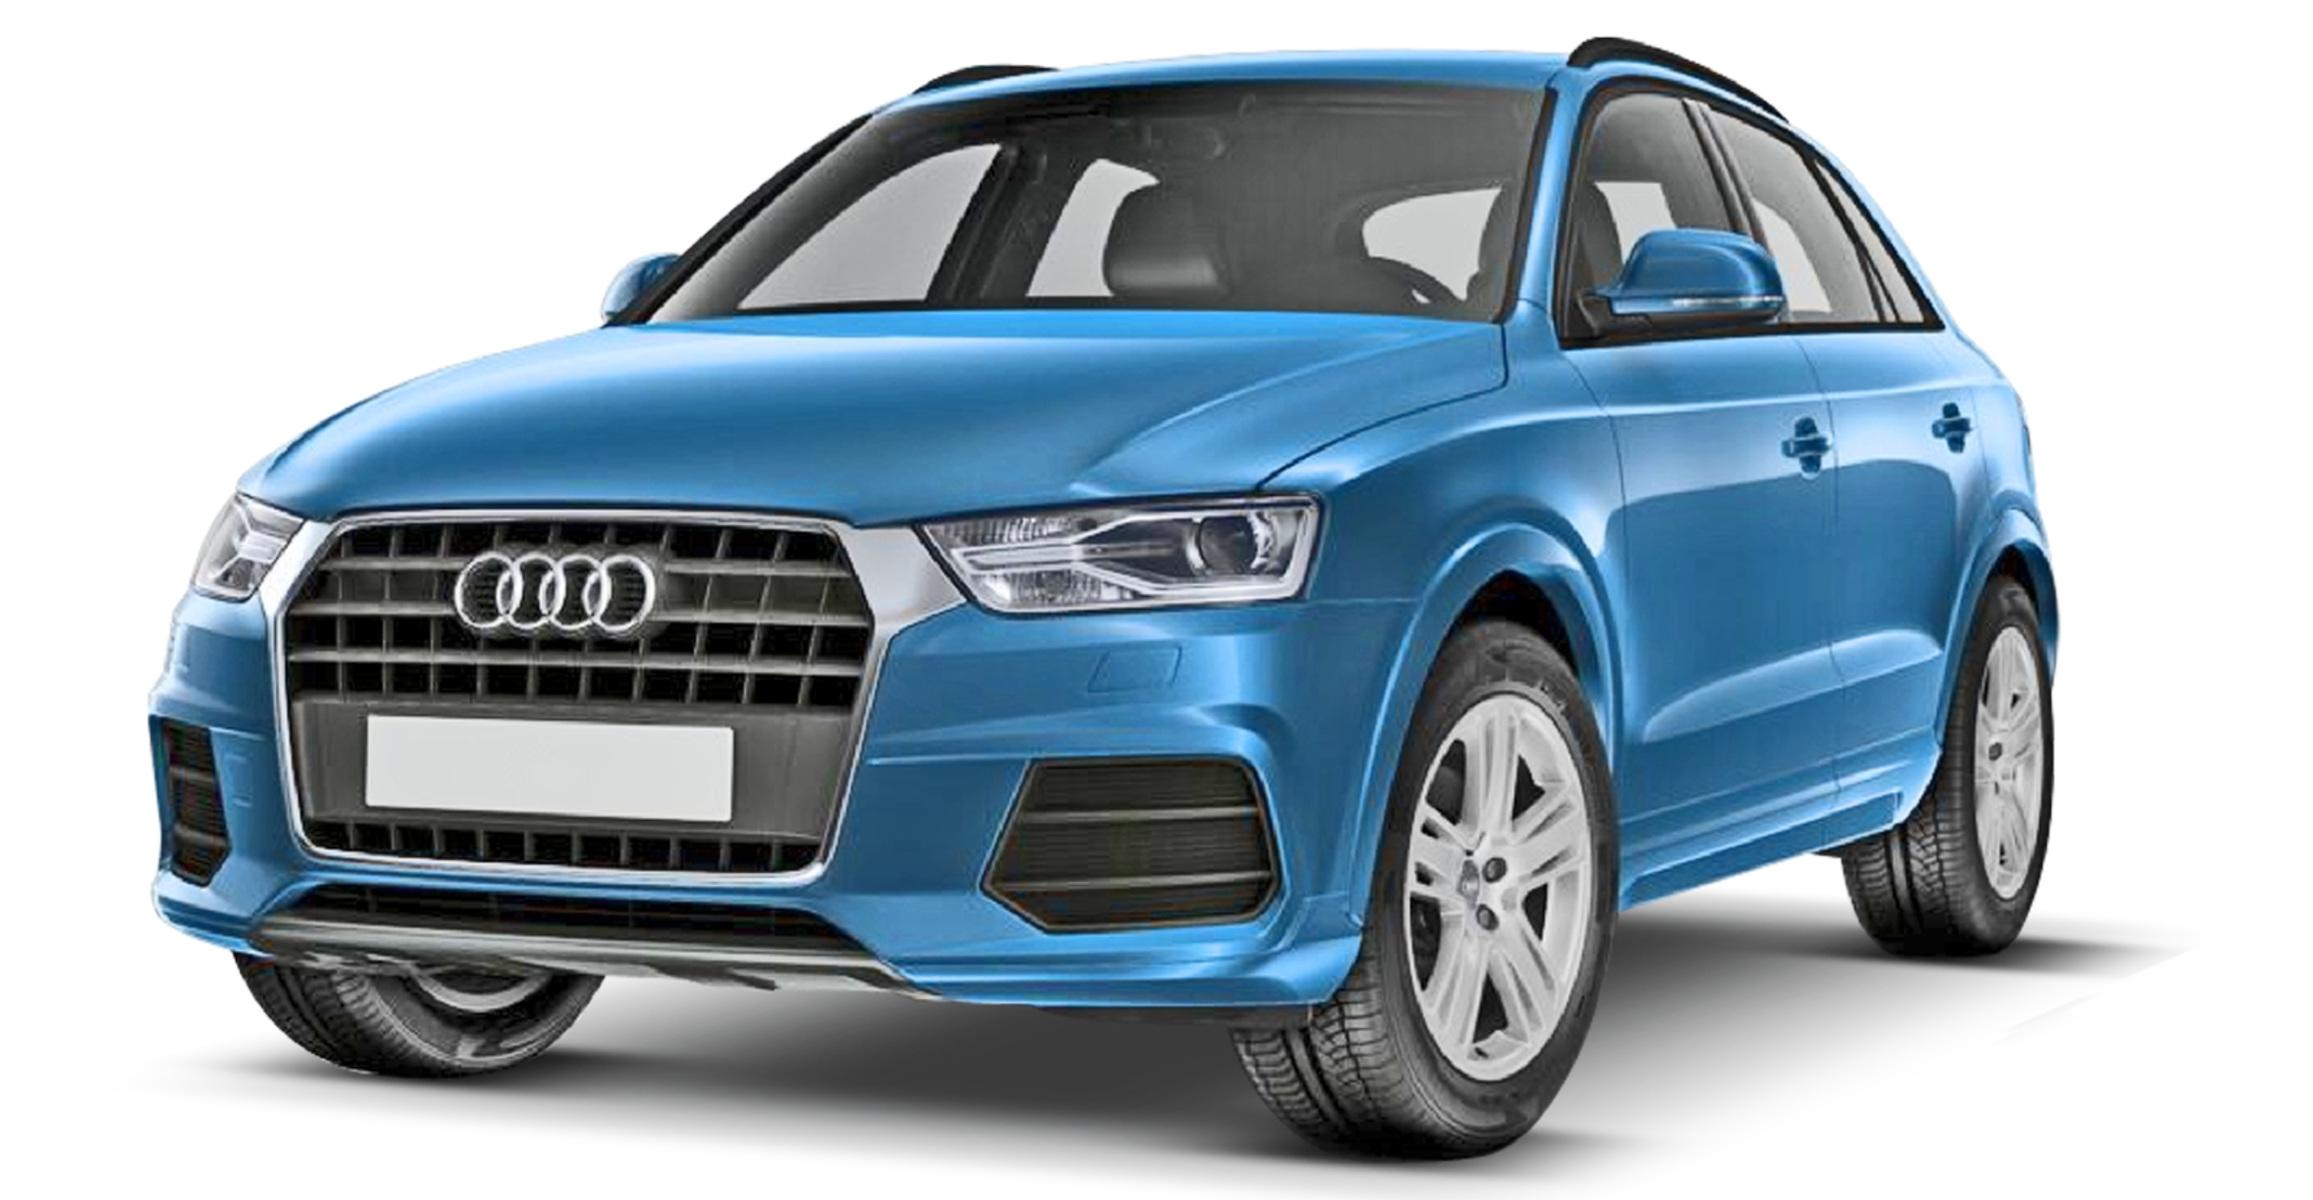 Audi r8 spyder black 2018 12